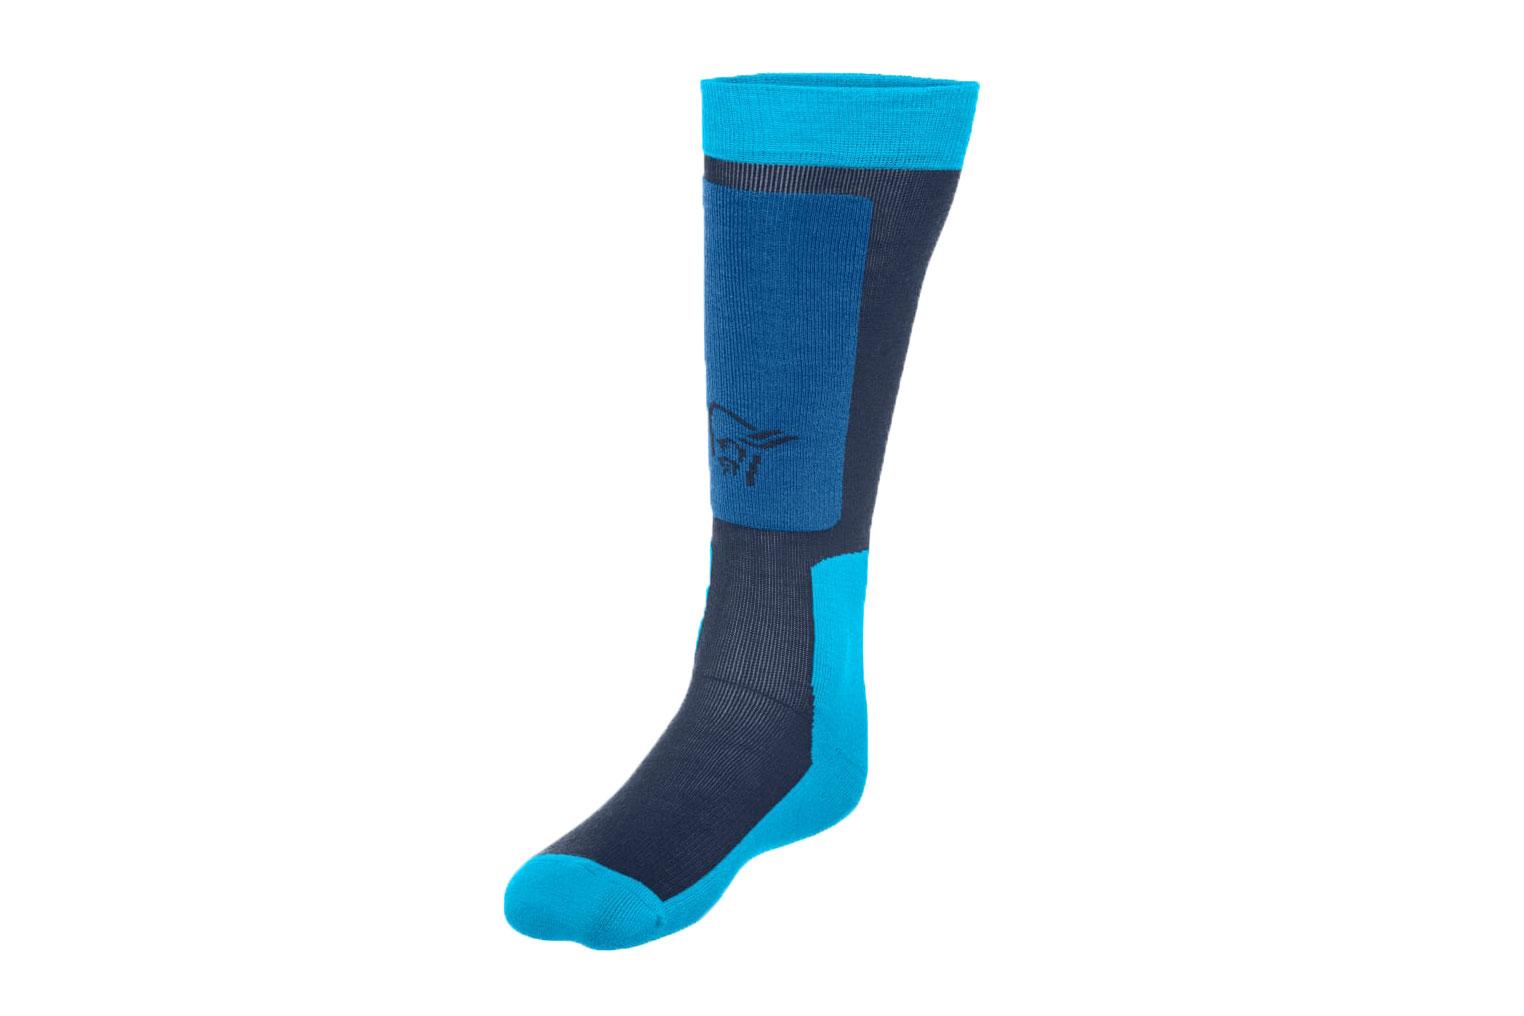 Norrona Lofoten Mid Weight Merino Sock Long